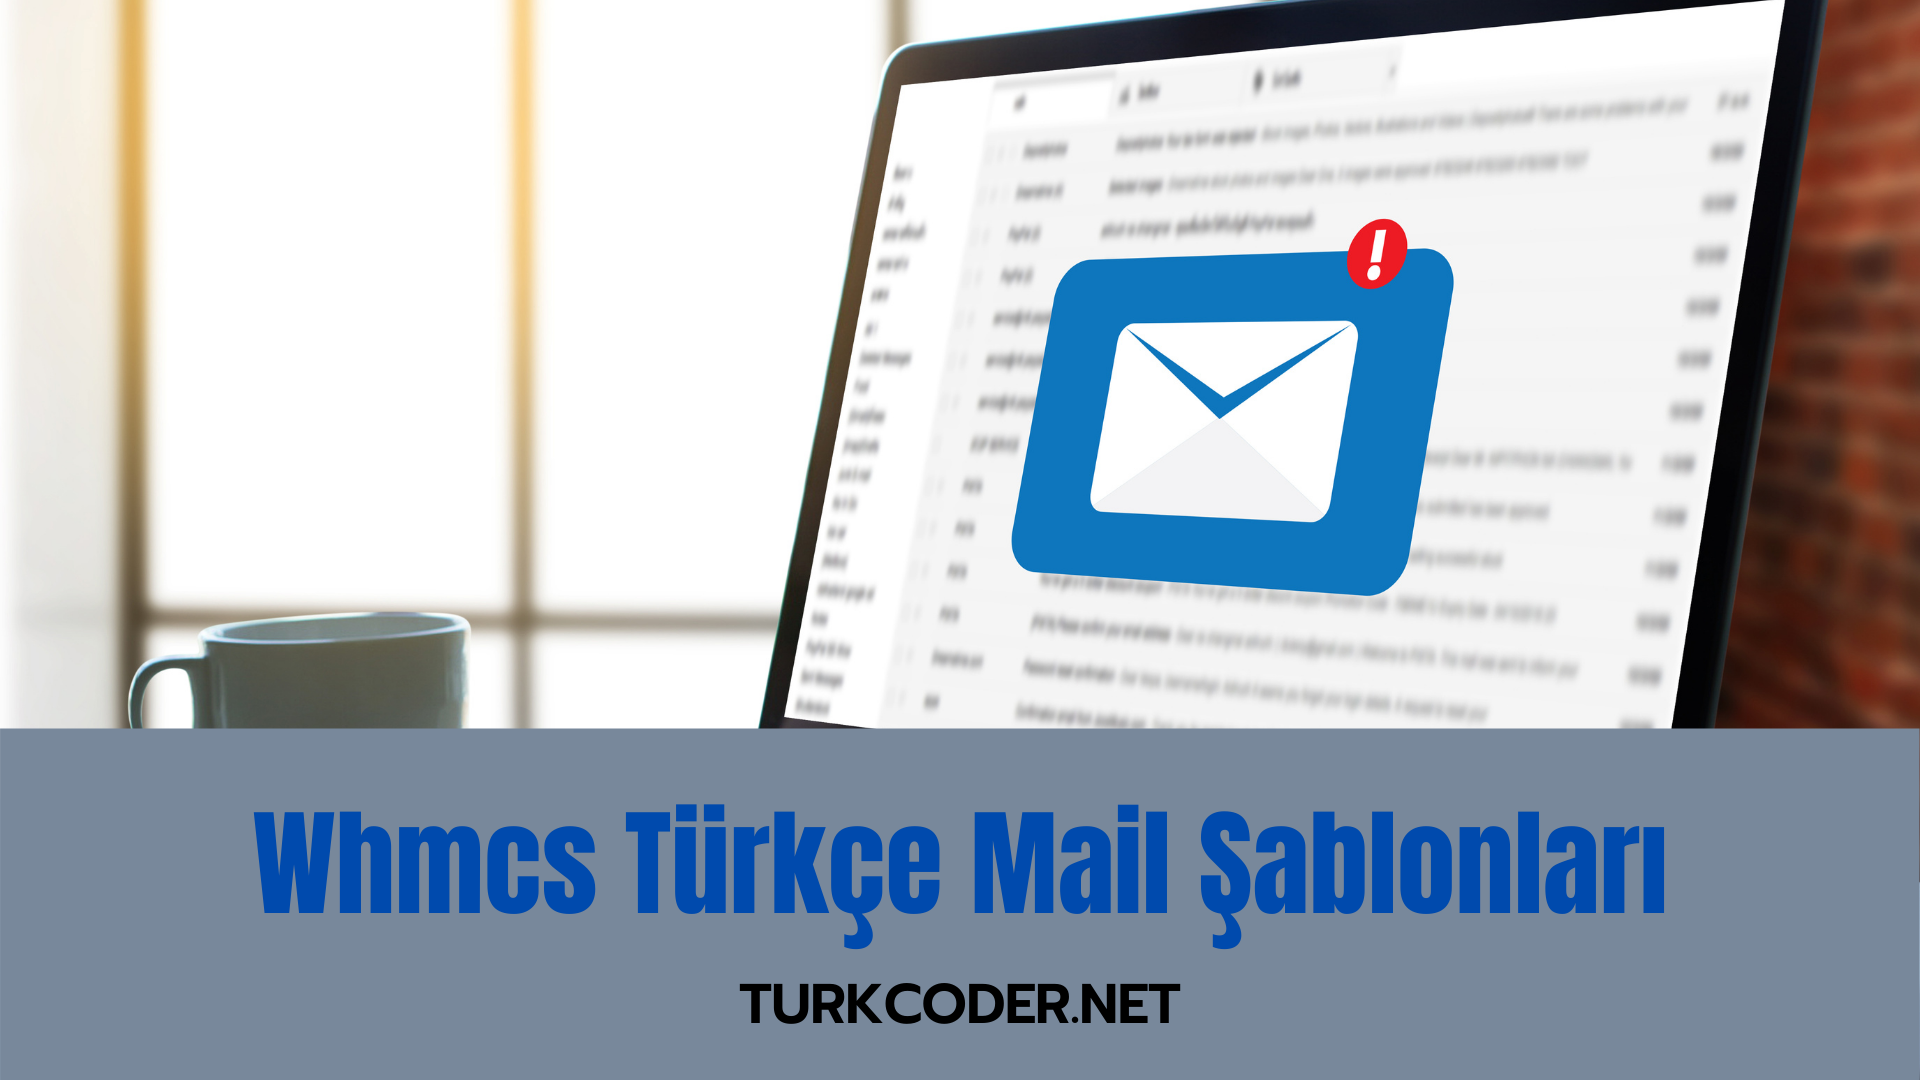 Whmcs Turkce Mail Sablonlar